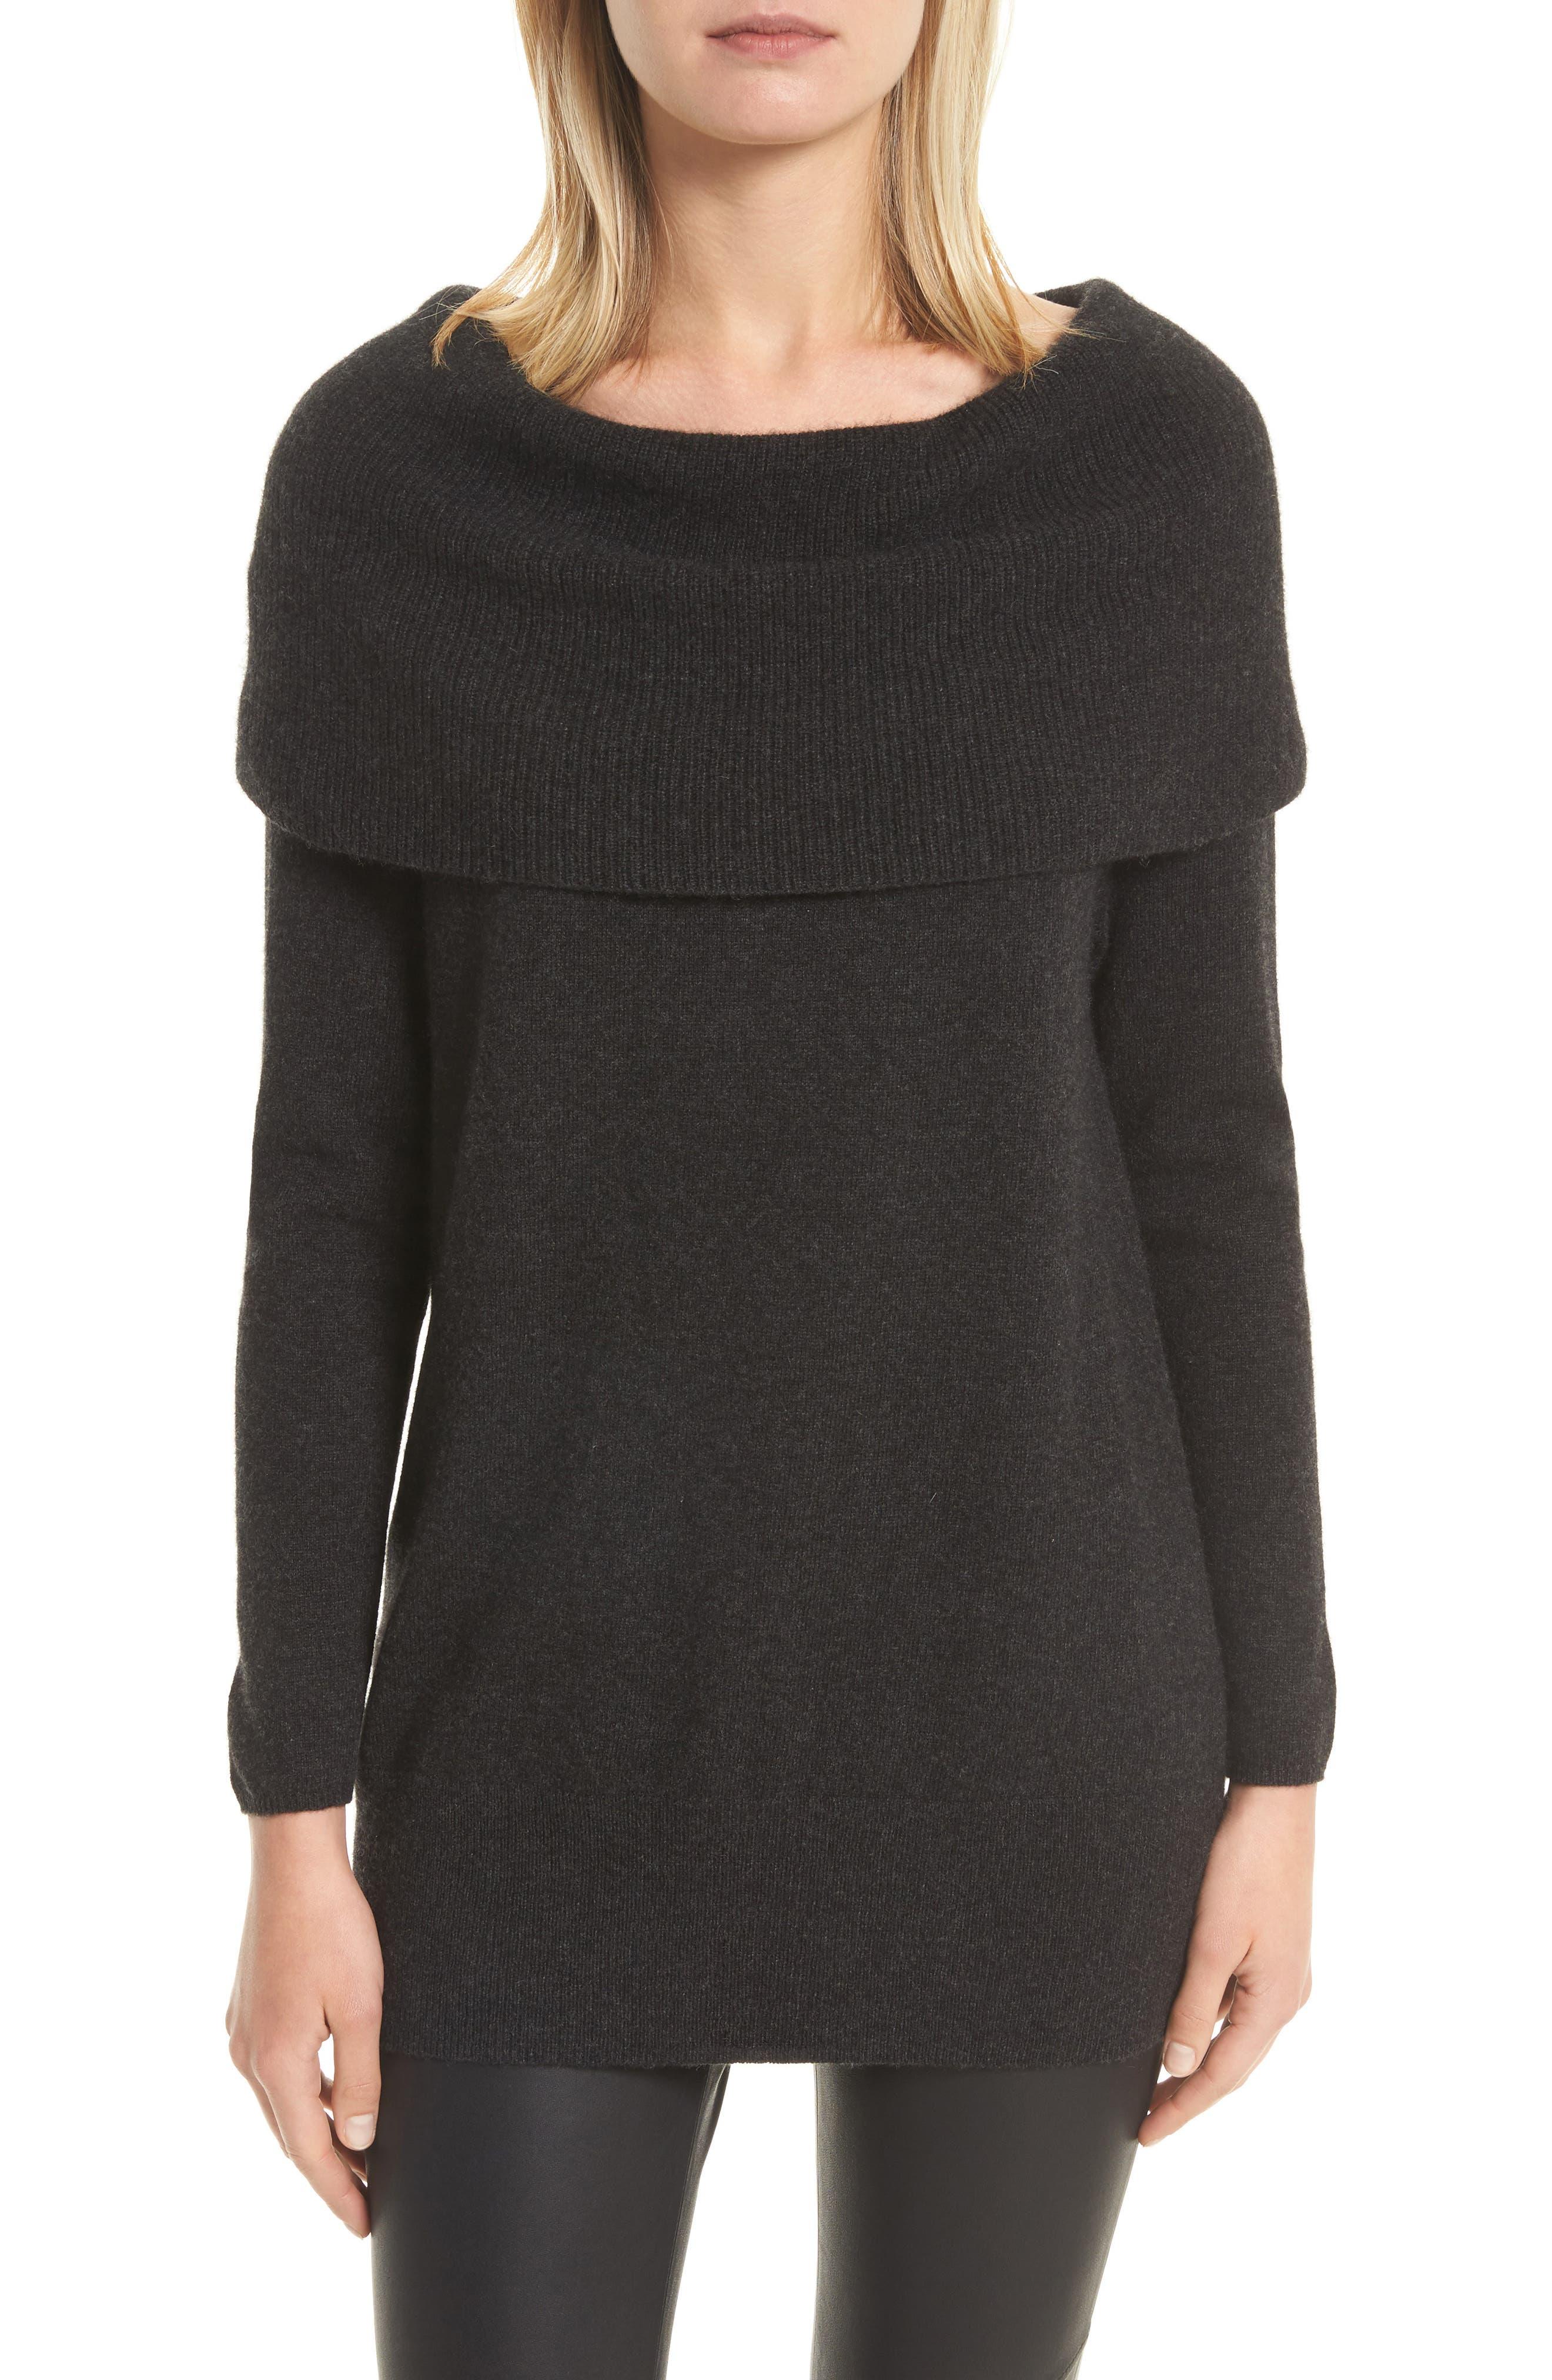 Joie Sibel Wool & Cashmere Sweater